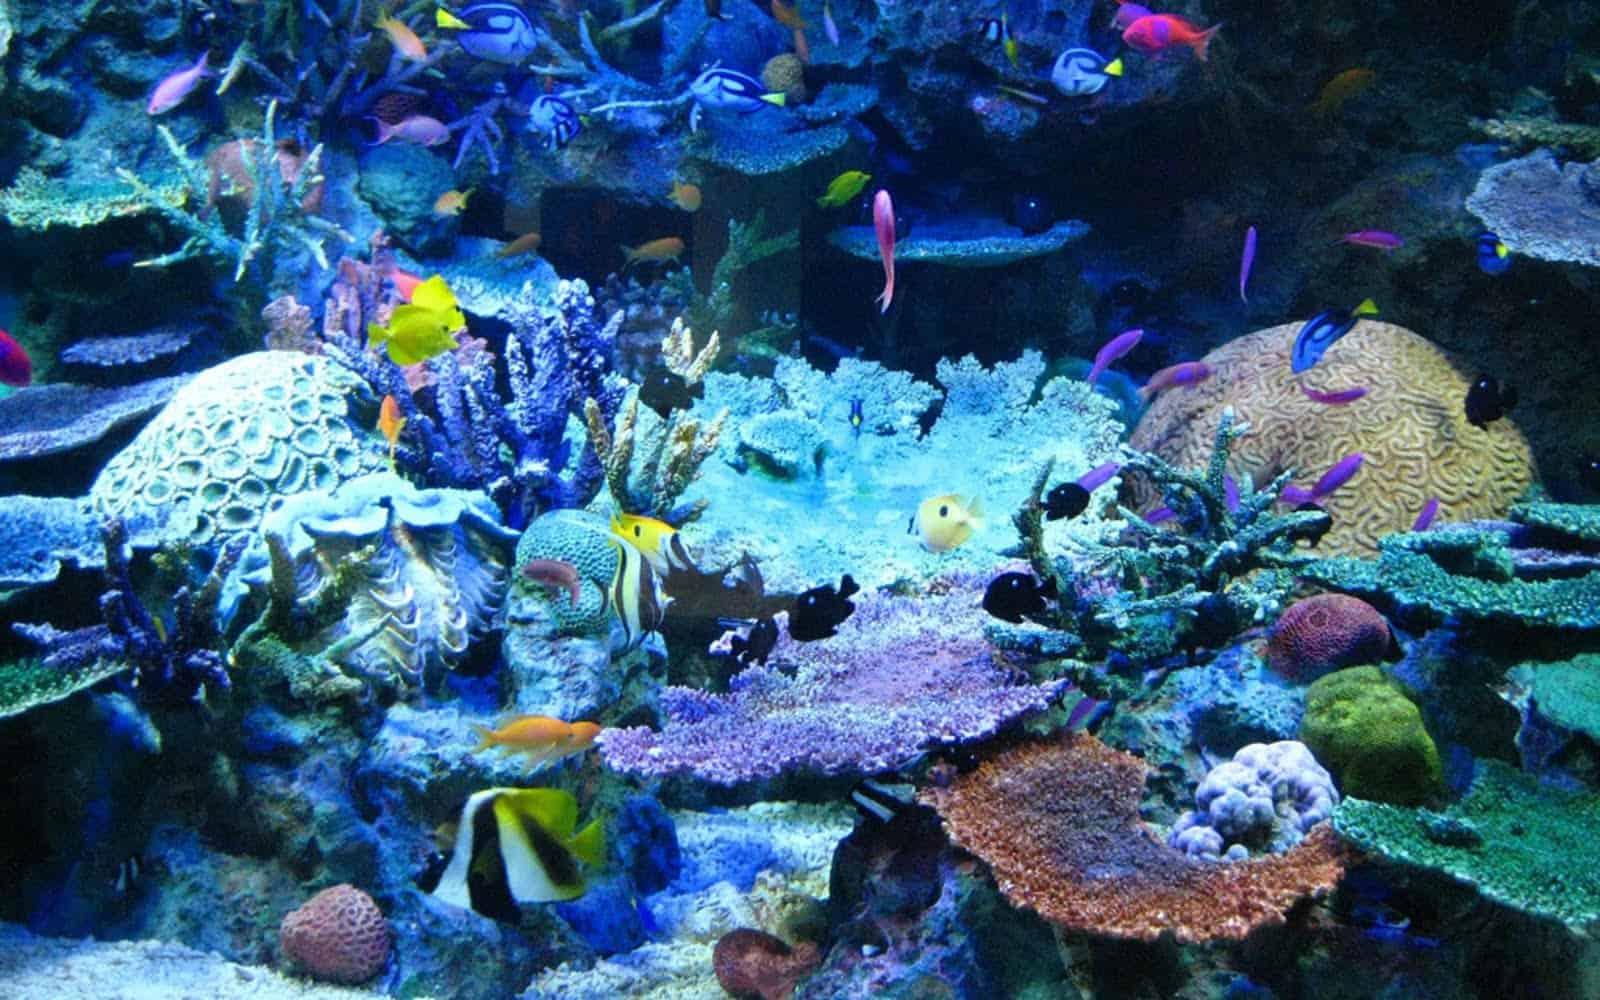 5-Coral-Reef-Fish